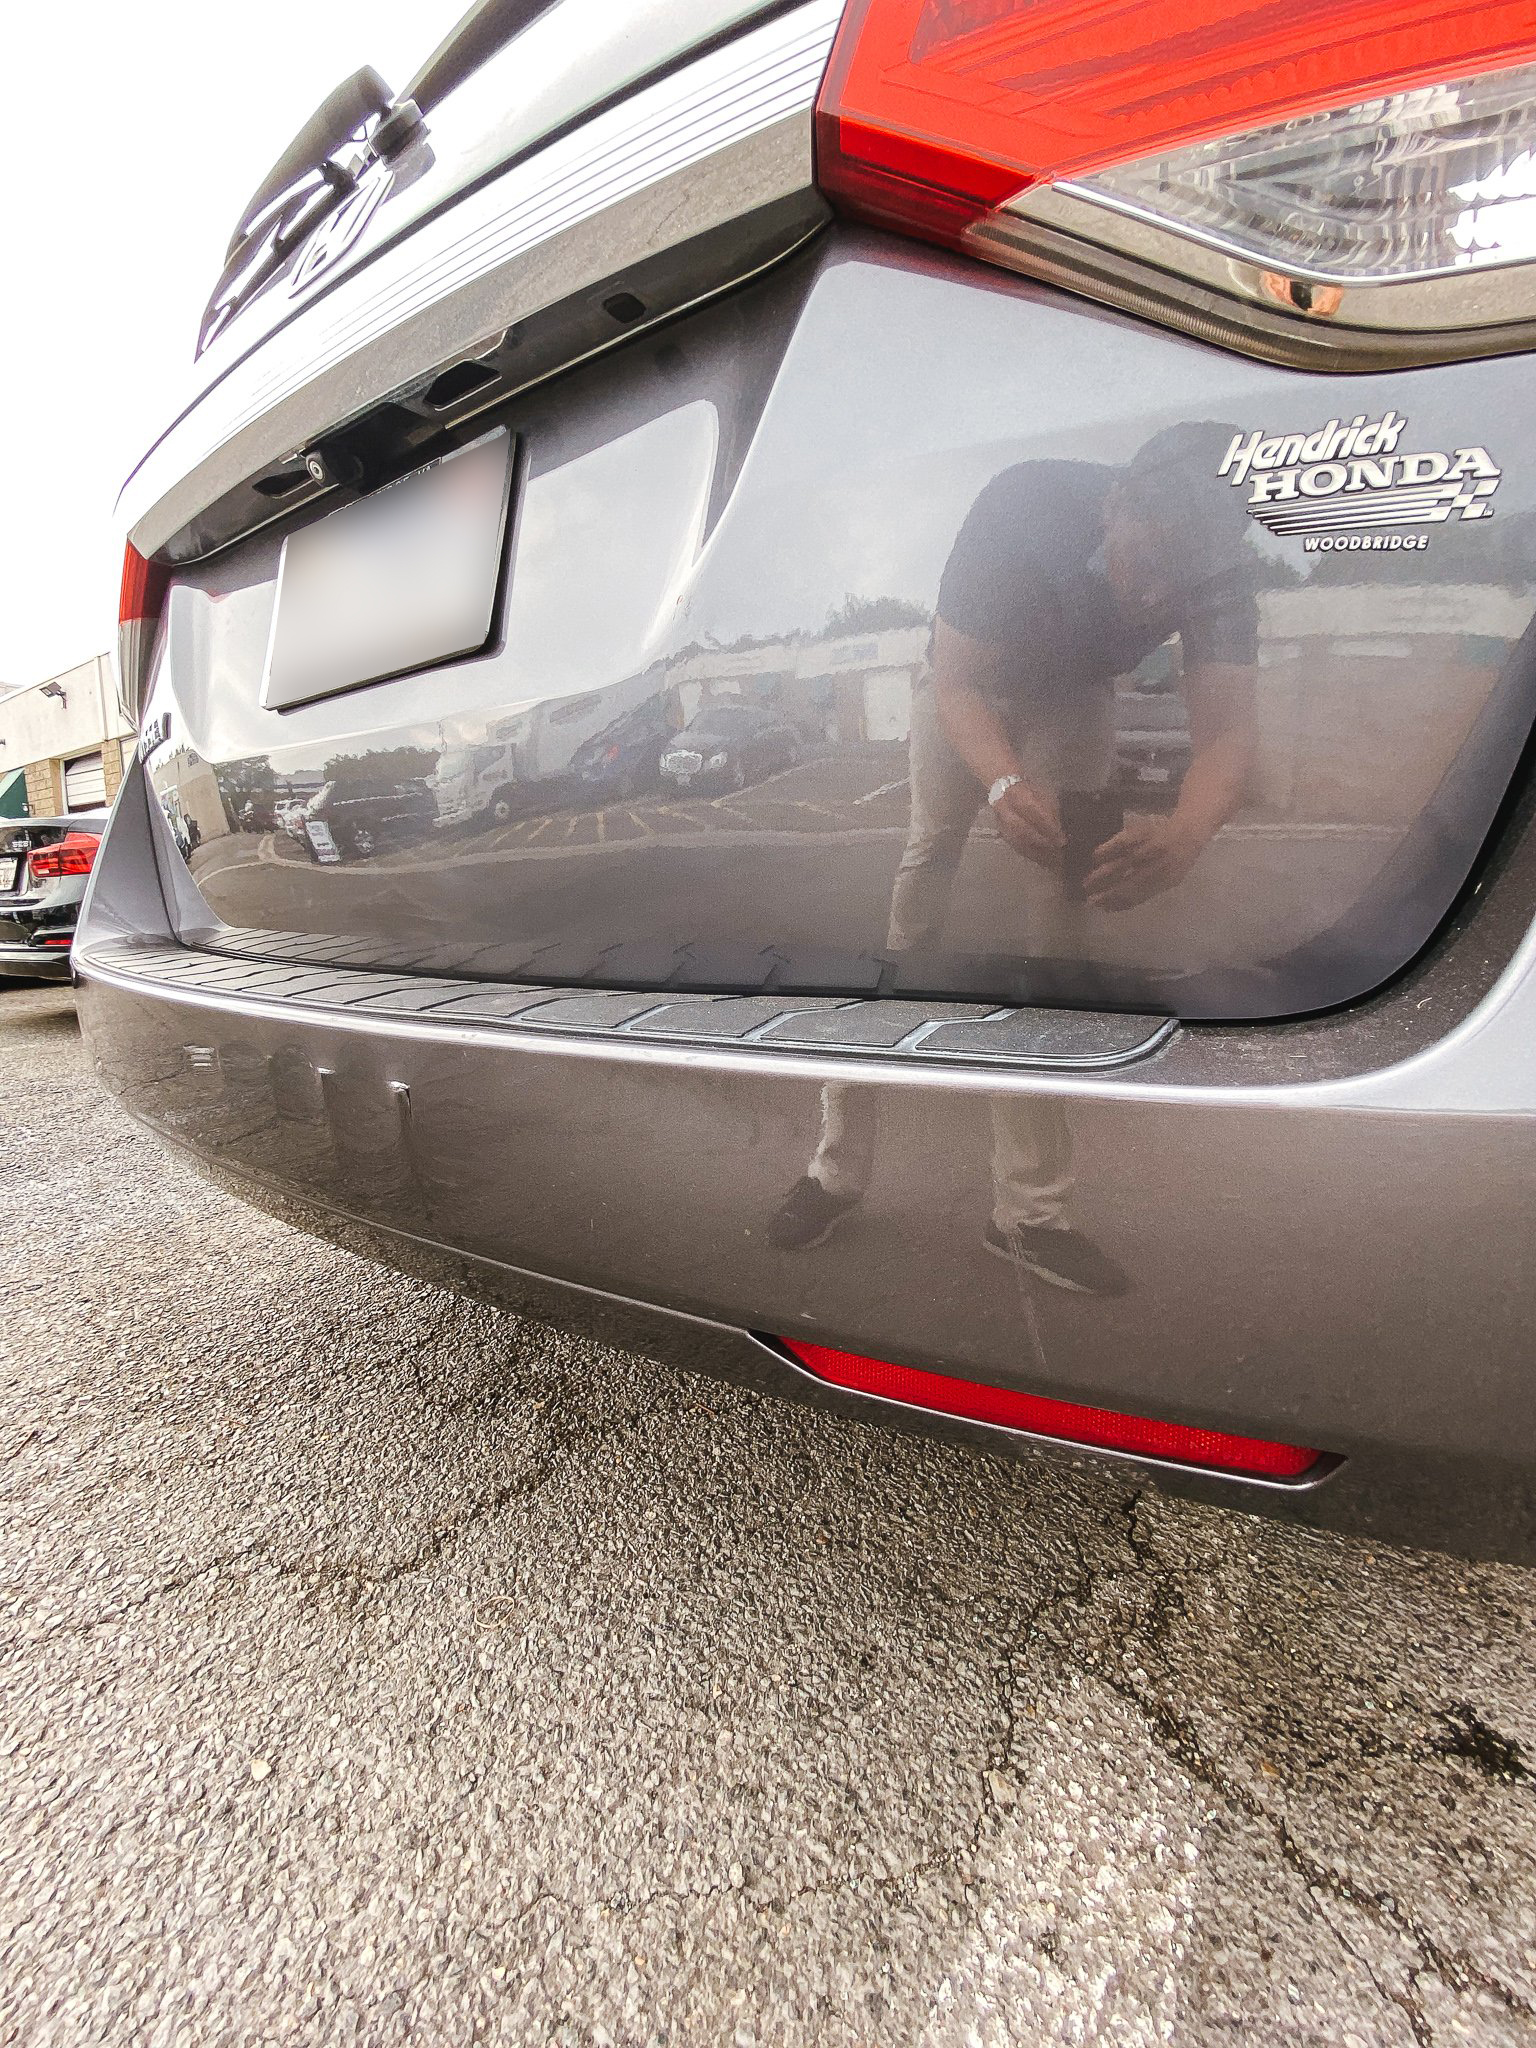 Nasty dent on rear hatch- AFTER